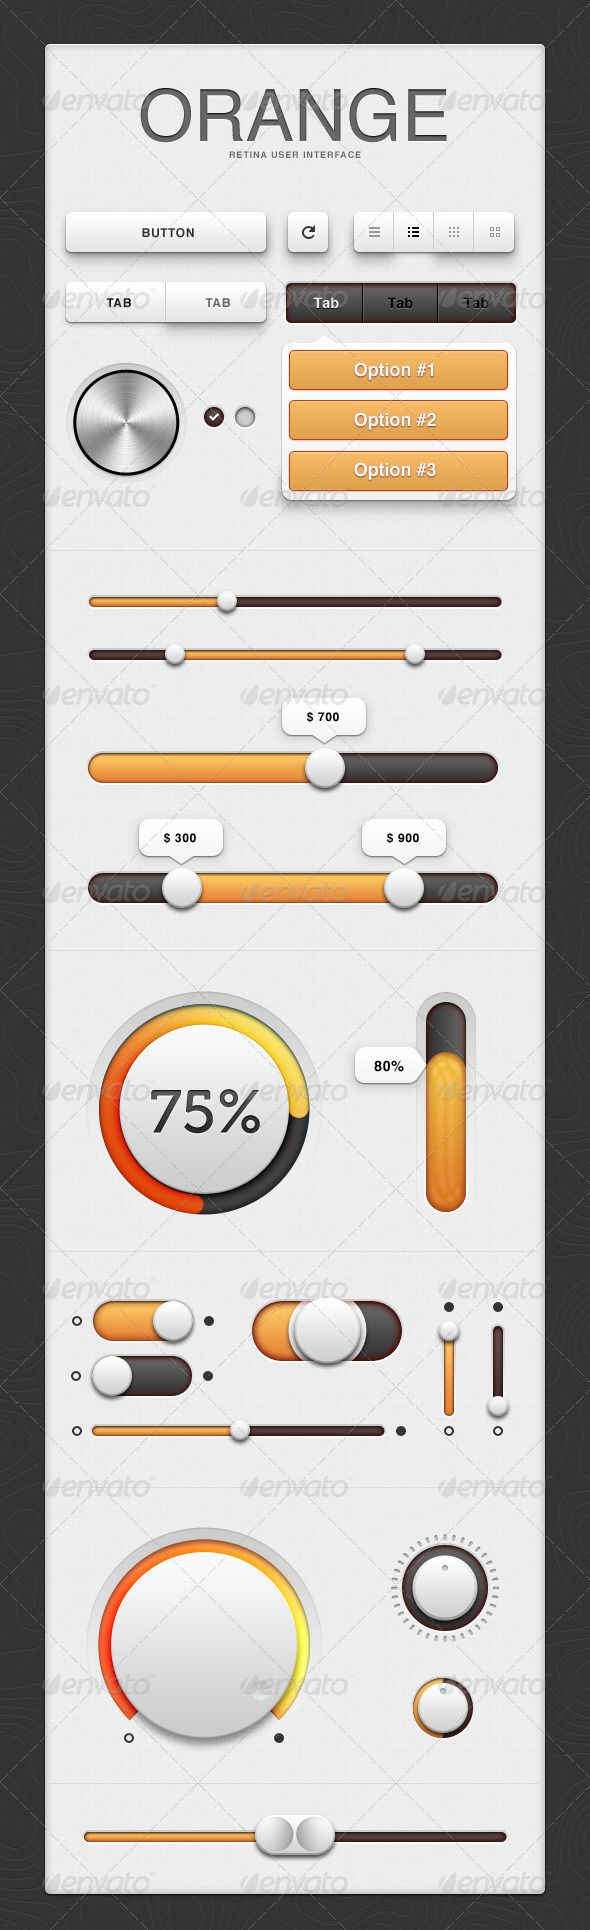 User Interface - Orange - GraphicRiver Item for Sale